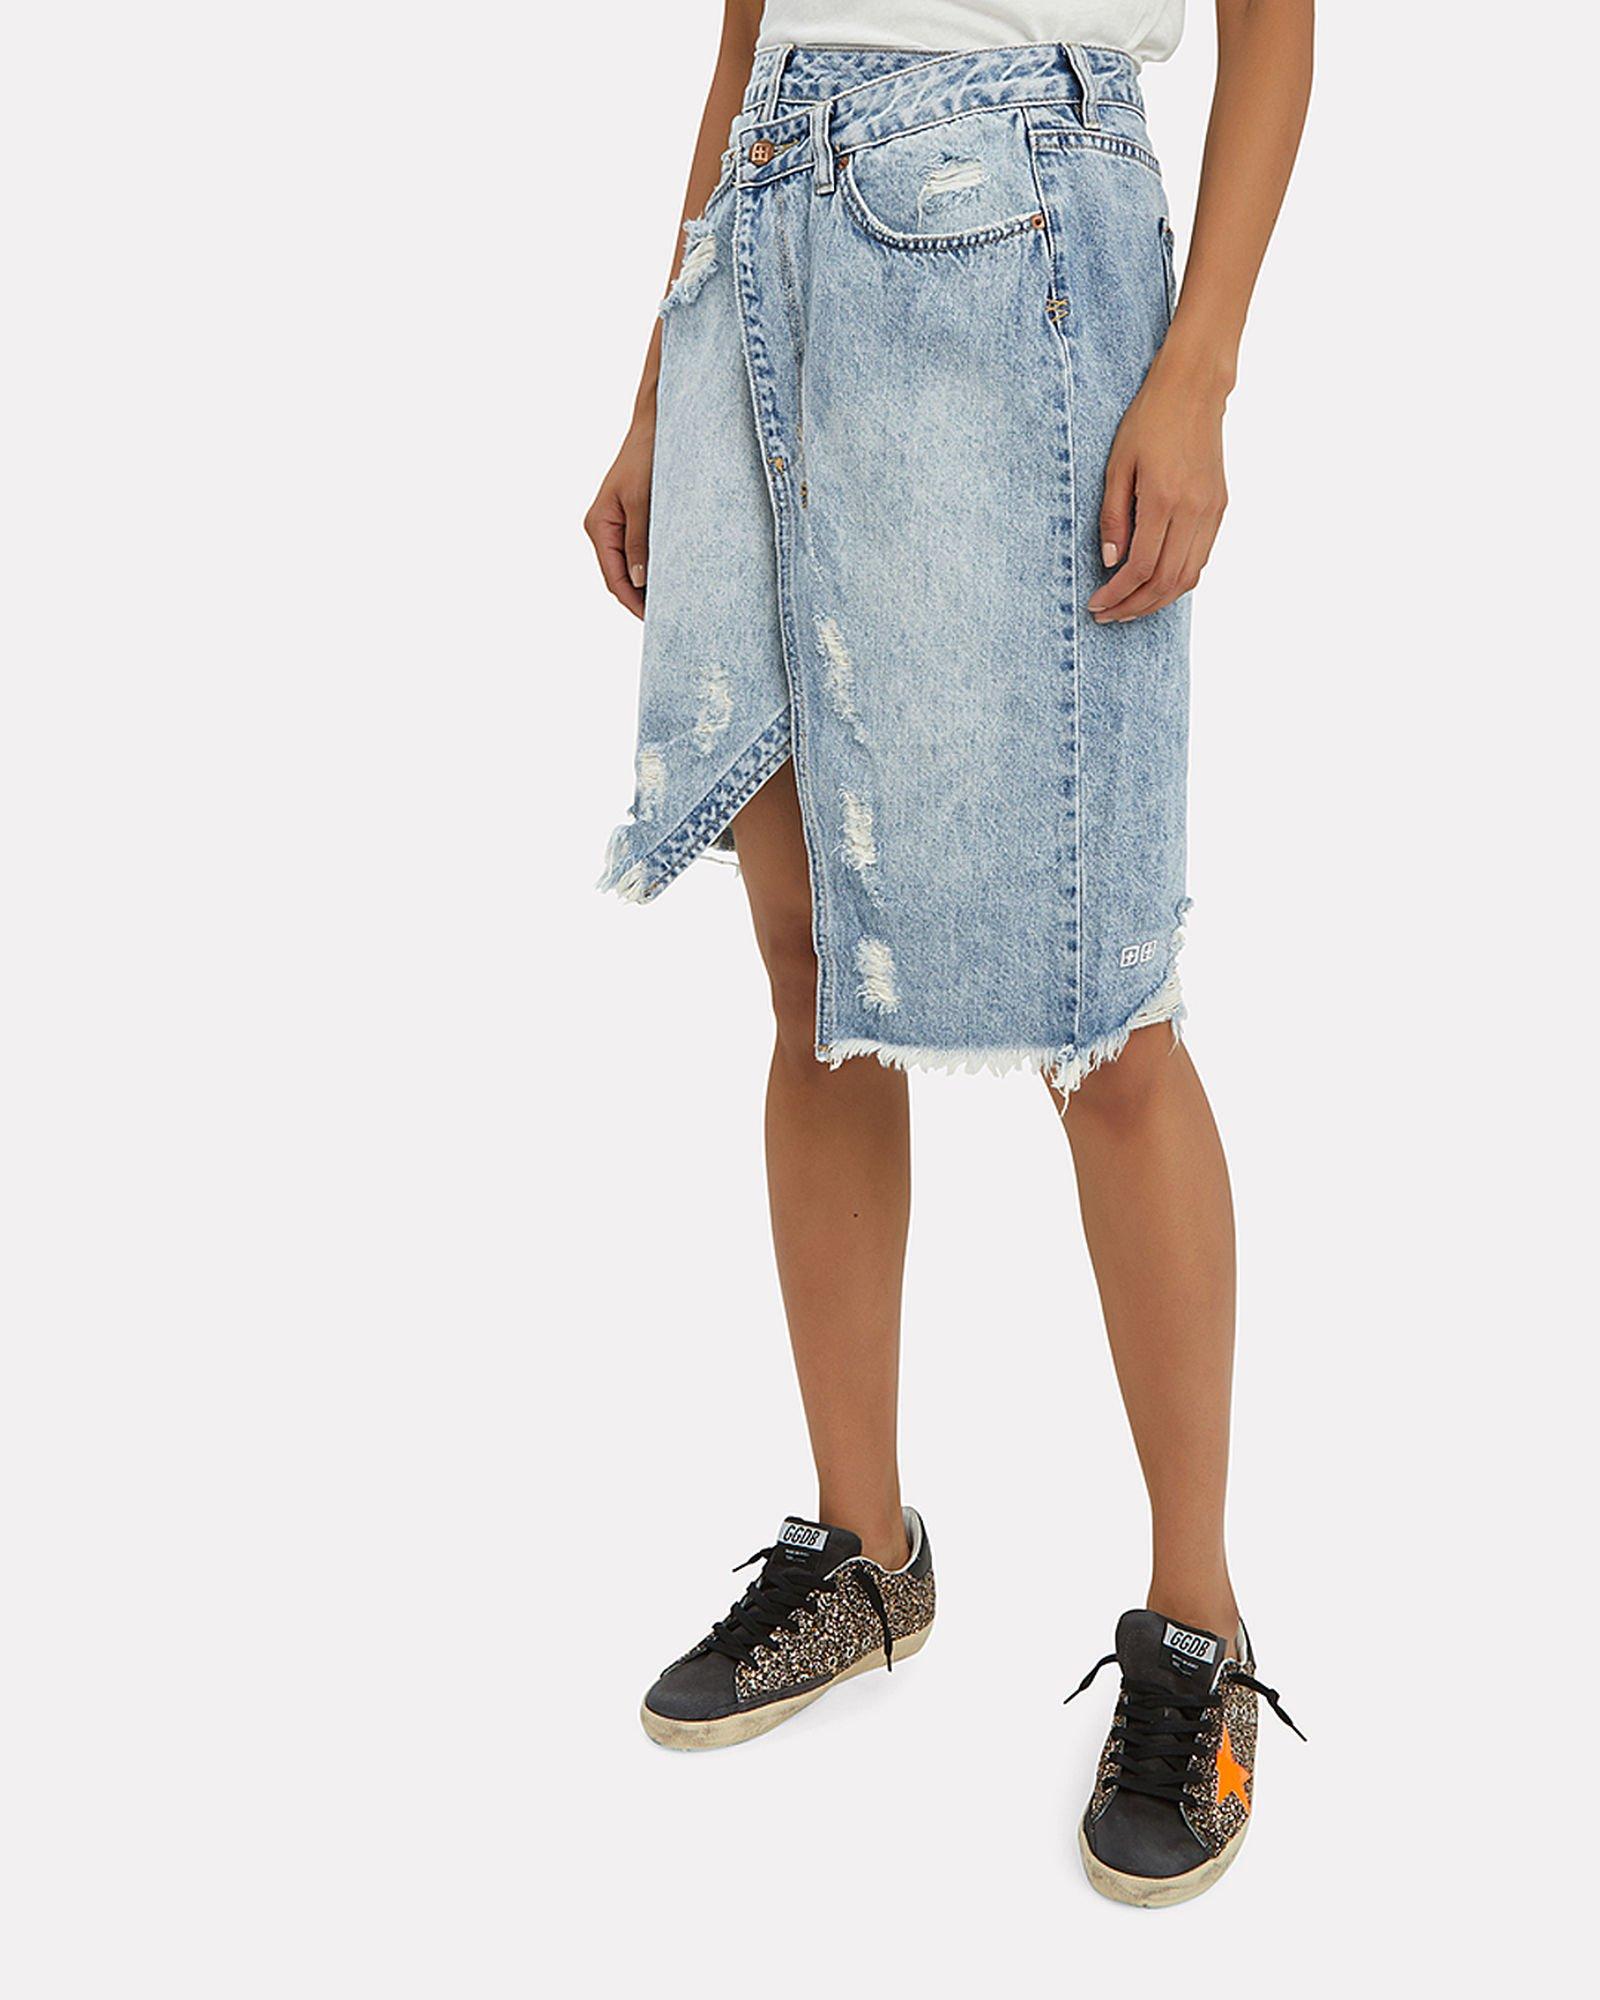 wrap skirt, wrap denim, jeans, denim skirt, white denim, ksubi, midi skirt